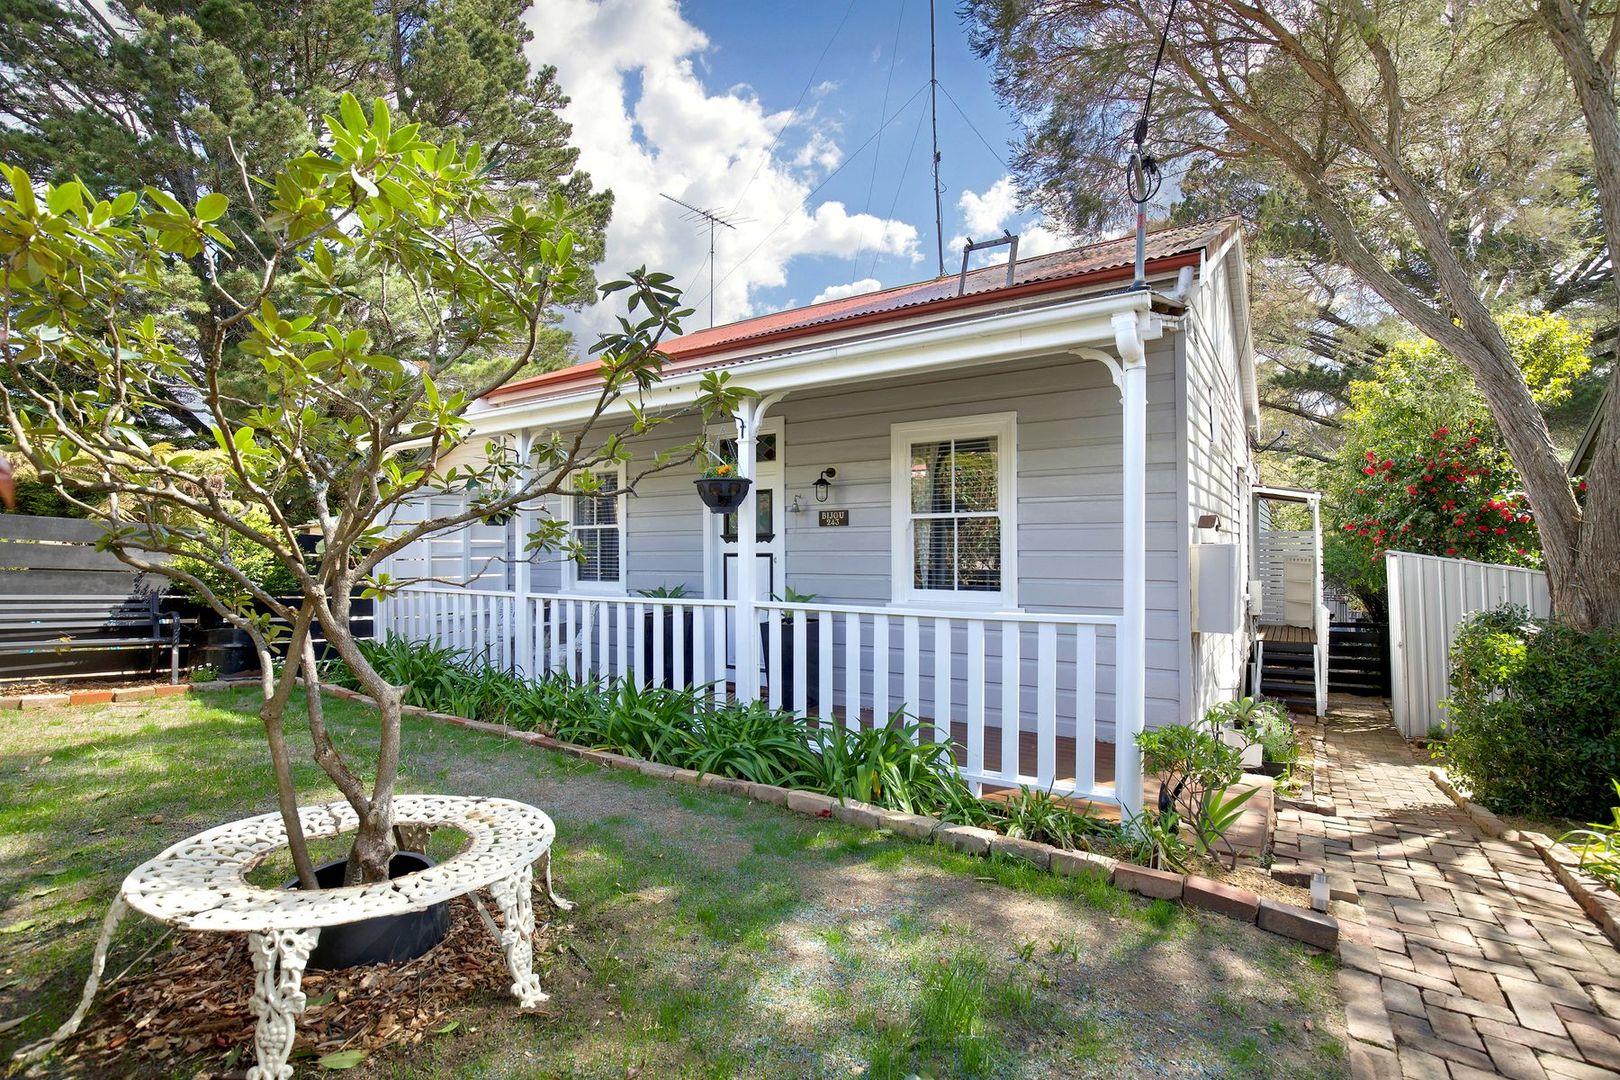 243 Katoomba Street, Katoomba NSW 2780, Image 0